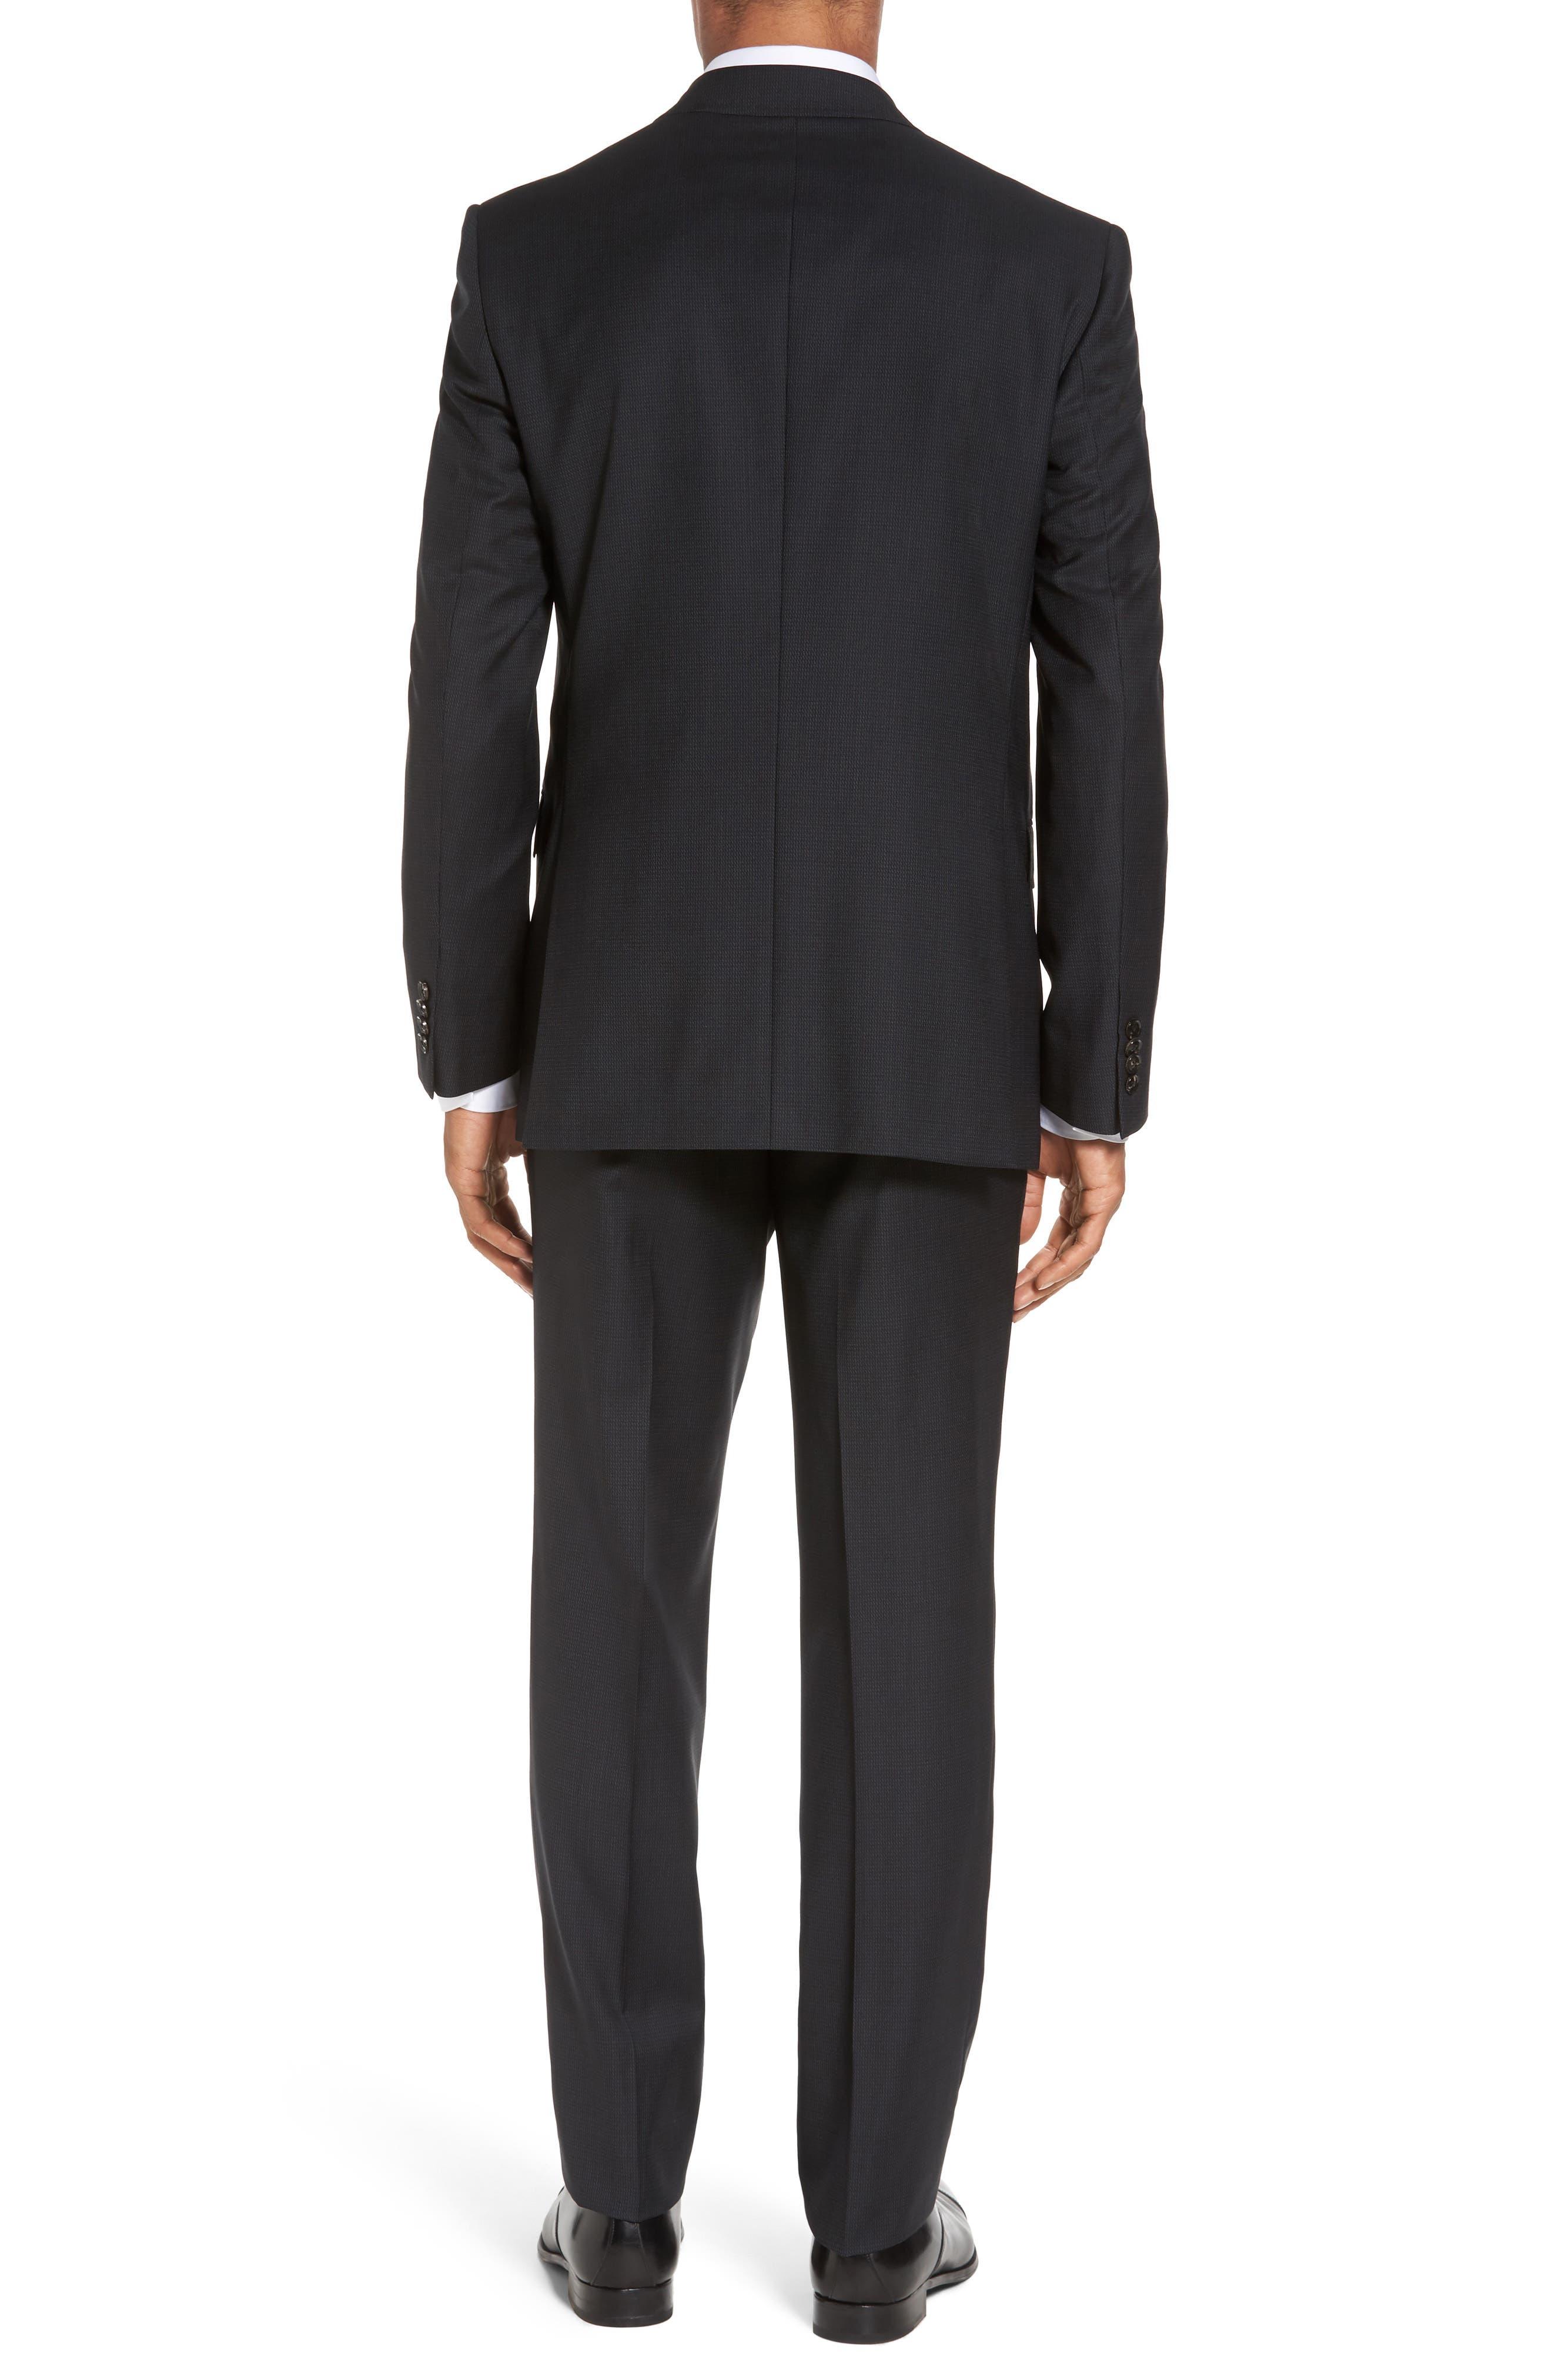 Jay Trim Fit Solid Wool Suit,                             Alternate thumbnail 2, color,                             001